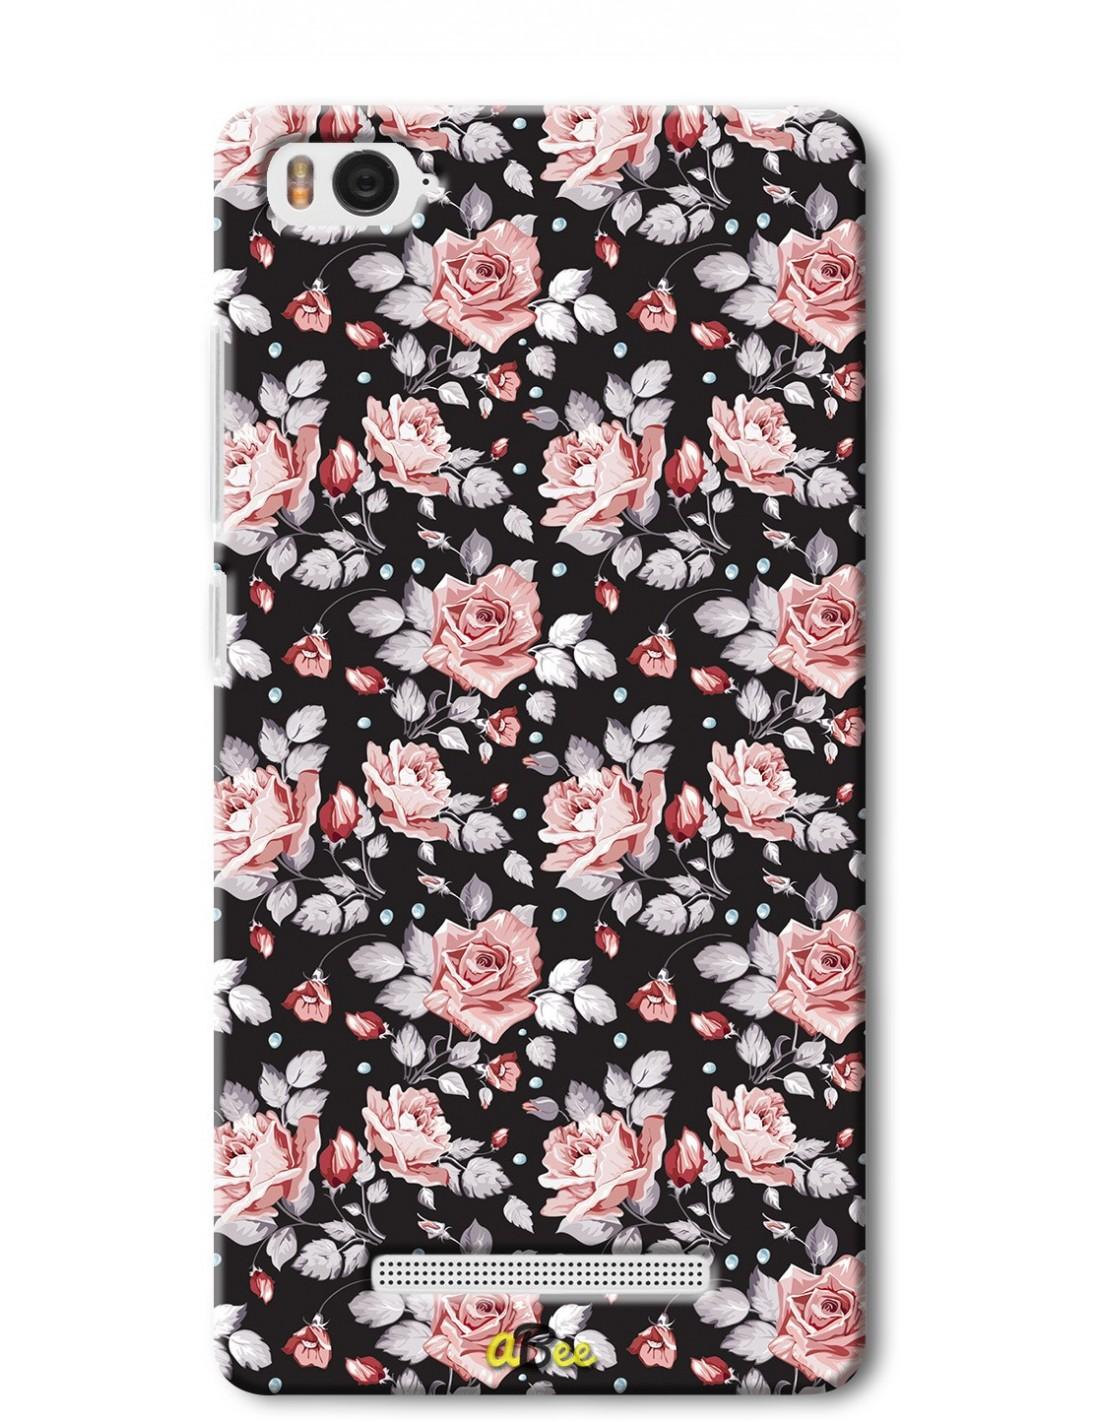 newest b893a 85ae9 First Roses - Mi4i Designer Mobile Case